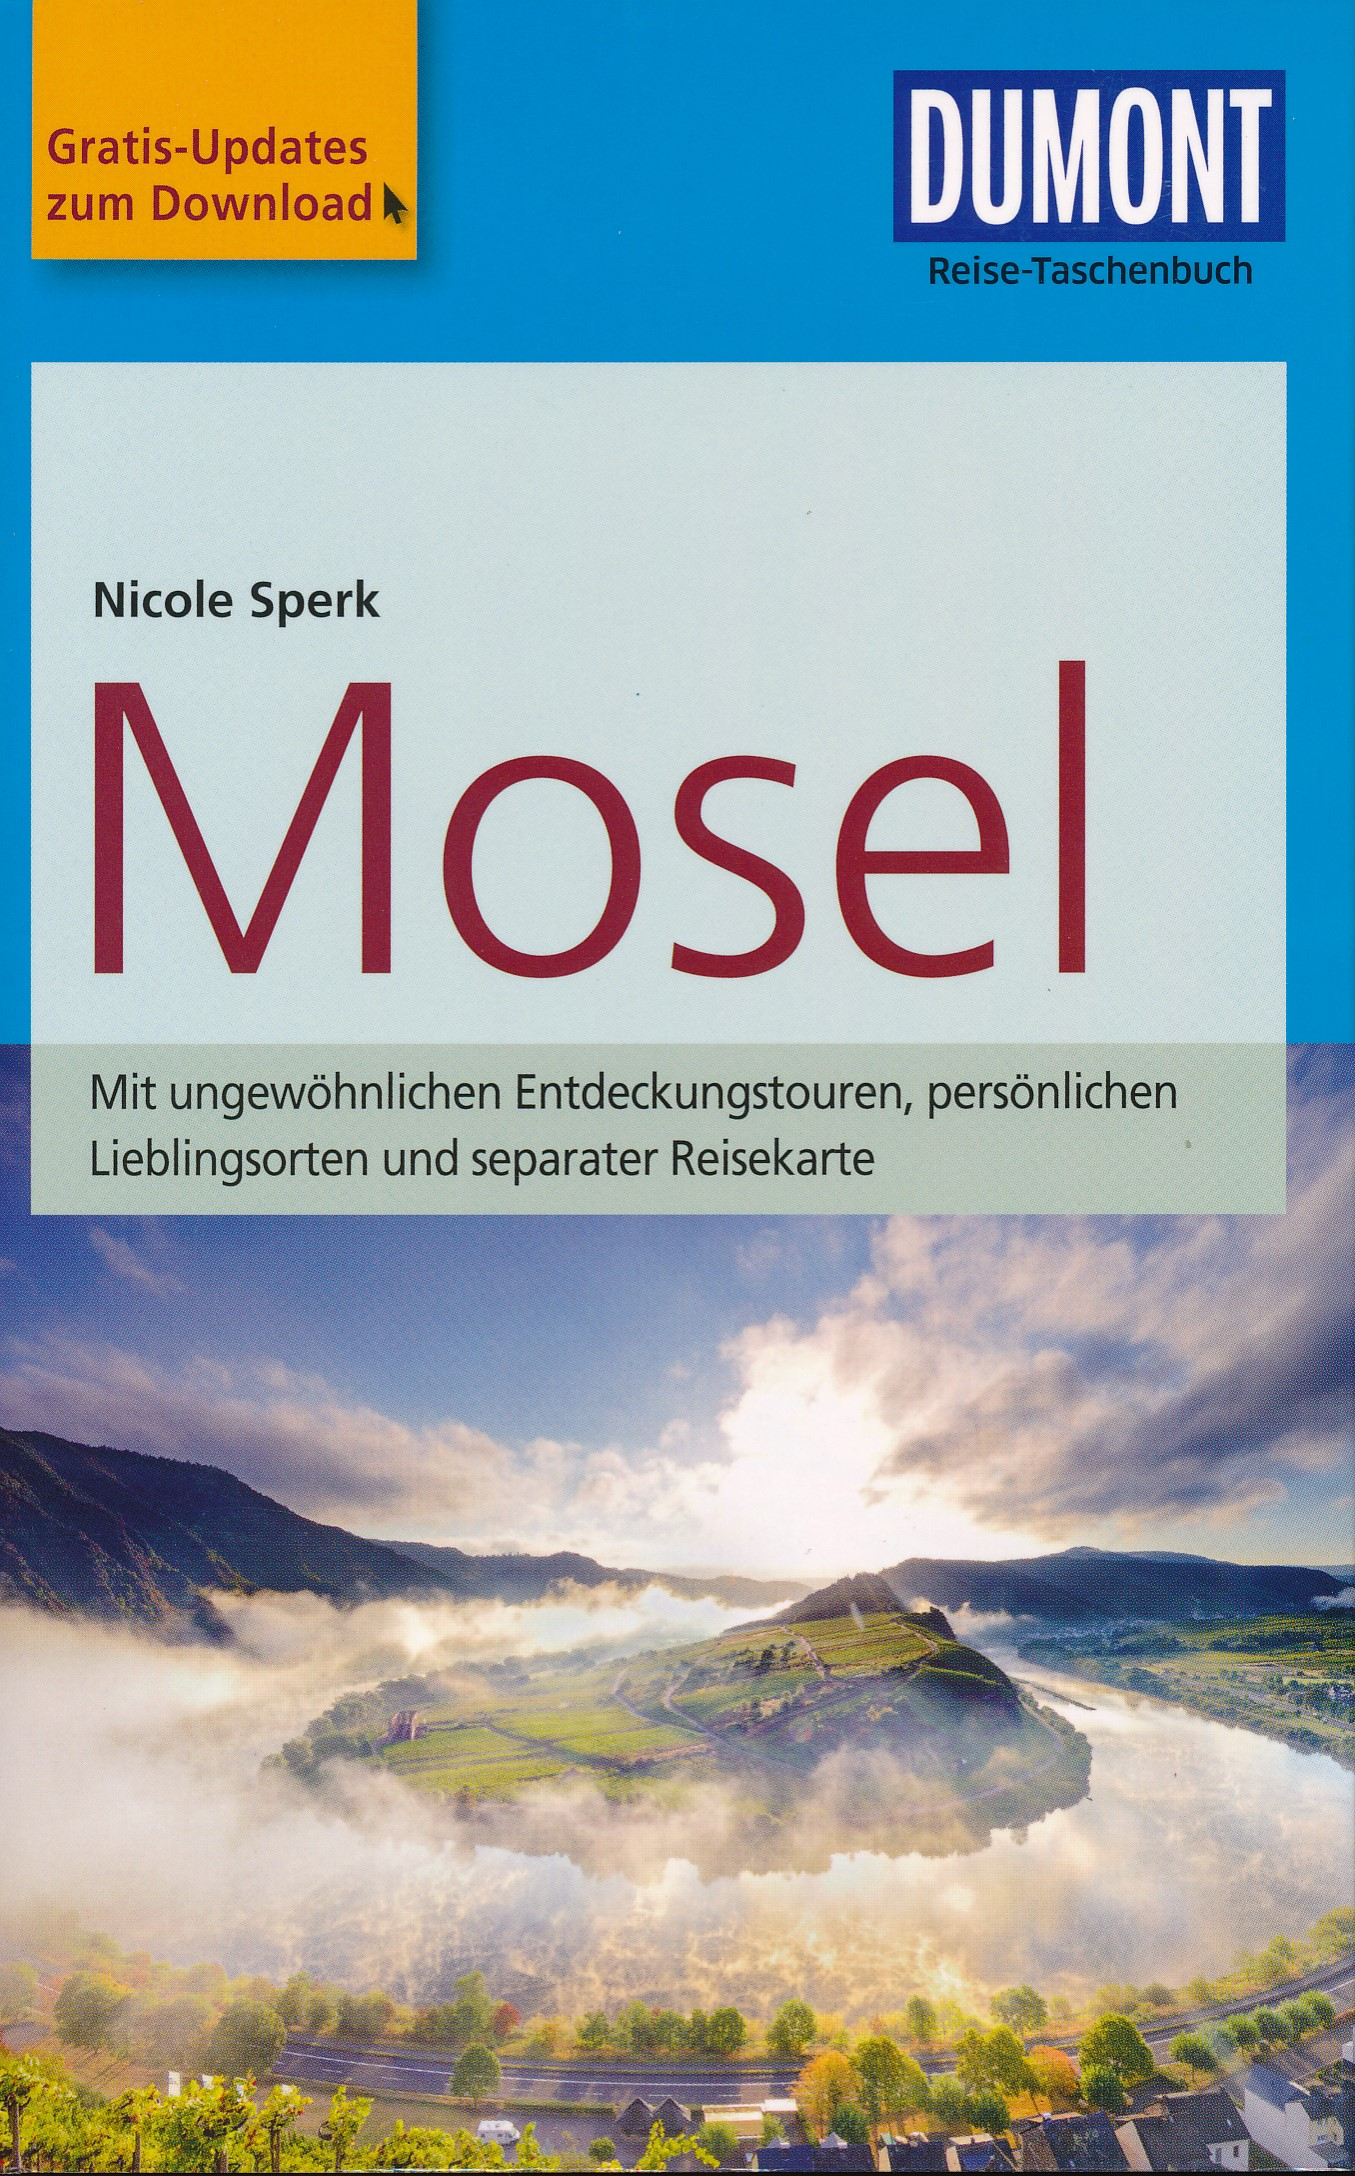 Reisgids Reise-Taschenbuch Mosel - Moezel | Dumont